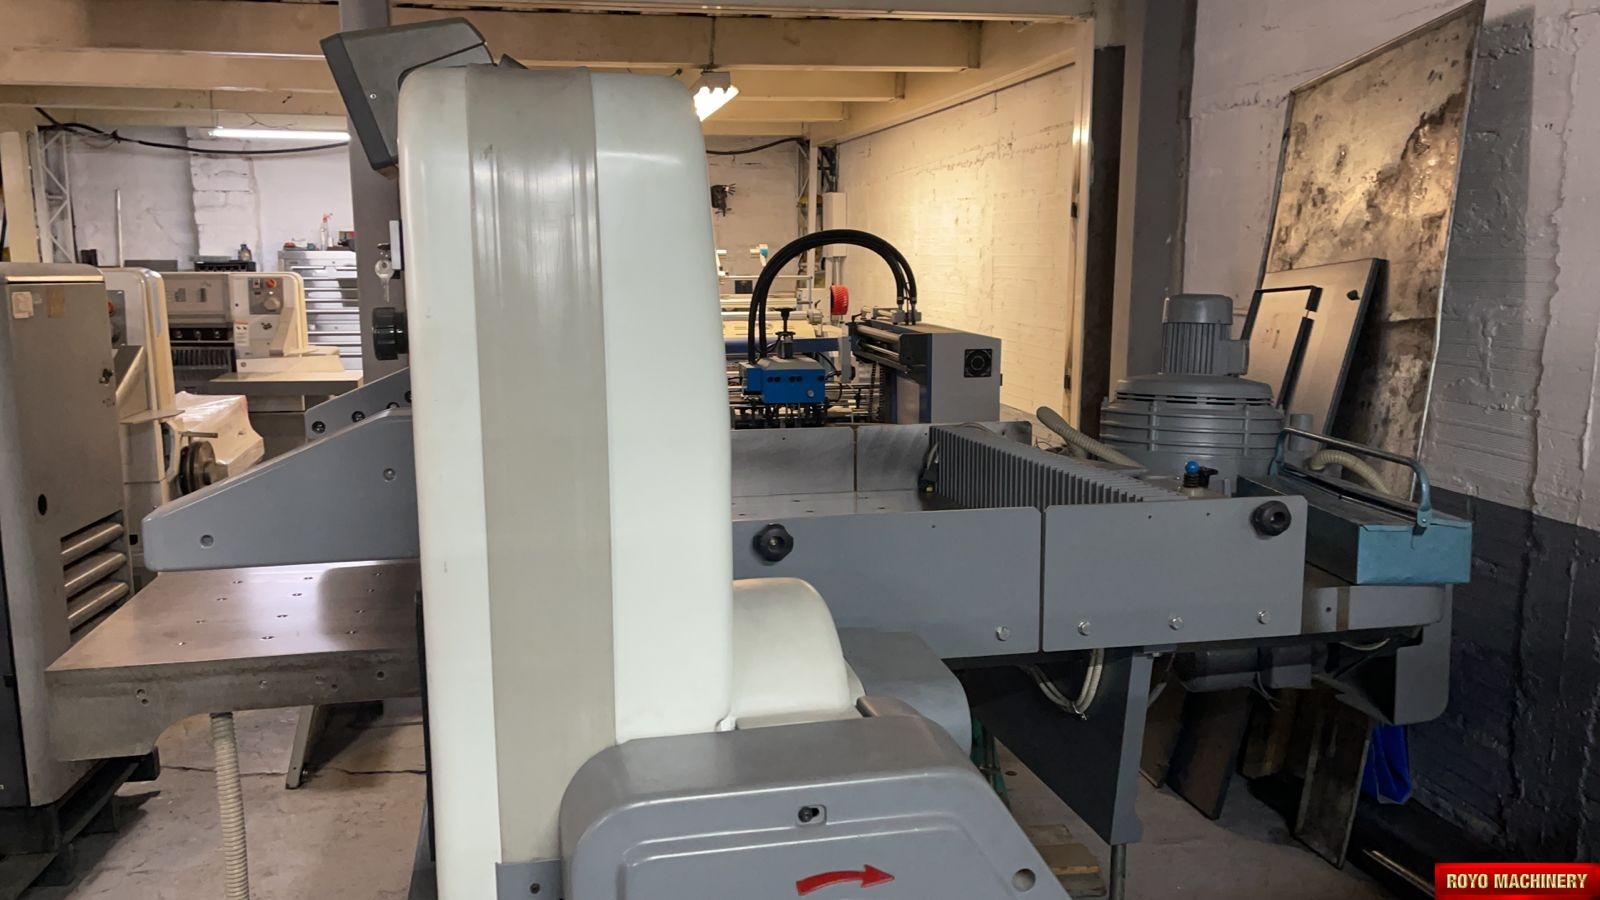 Polar 115 EMC MON